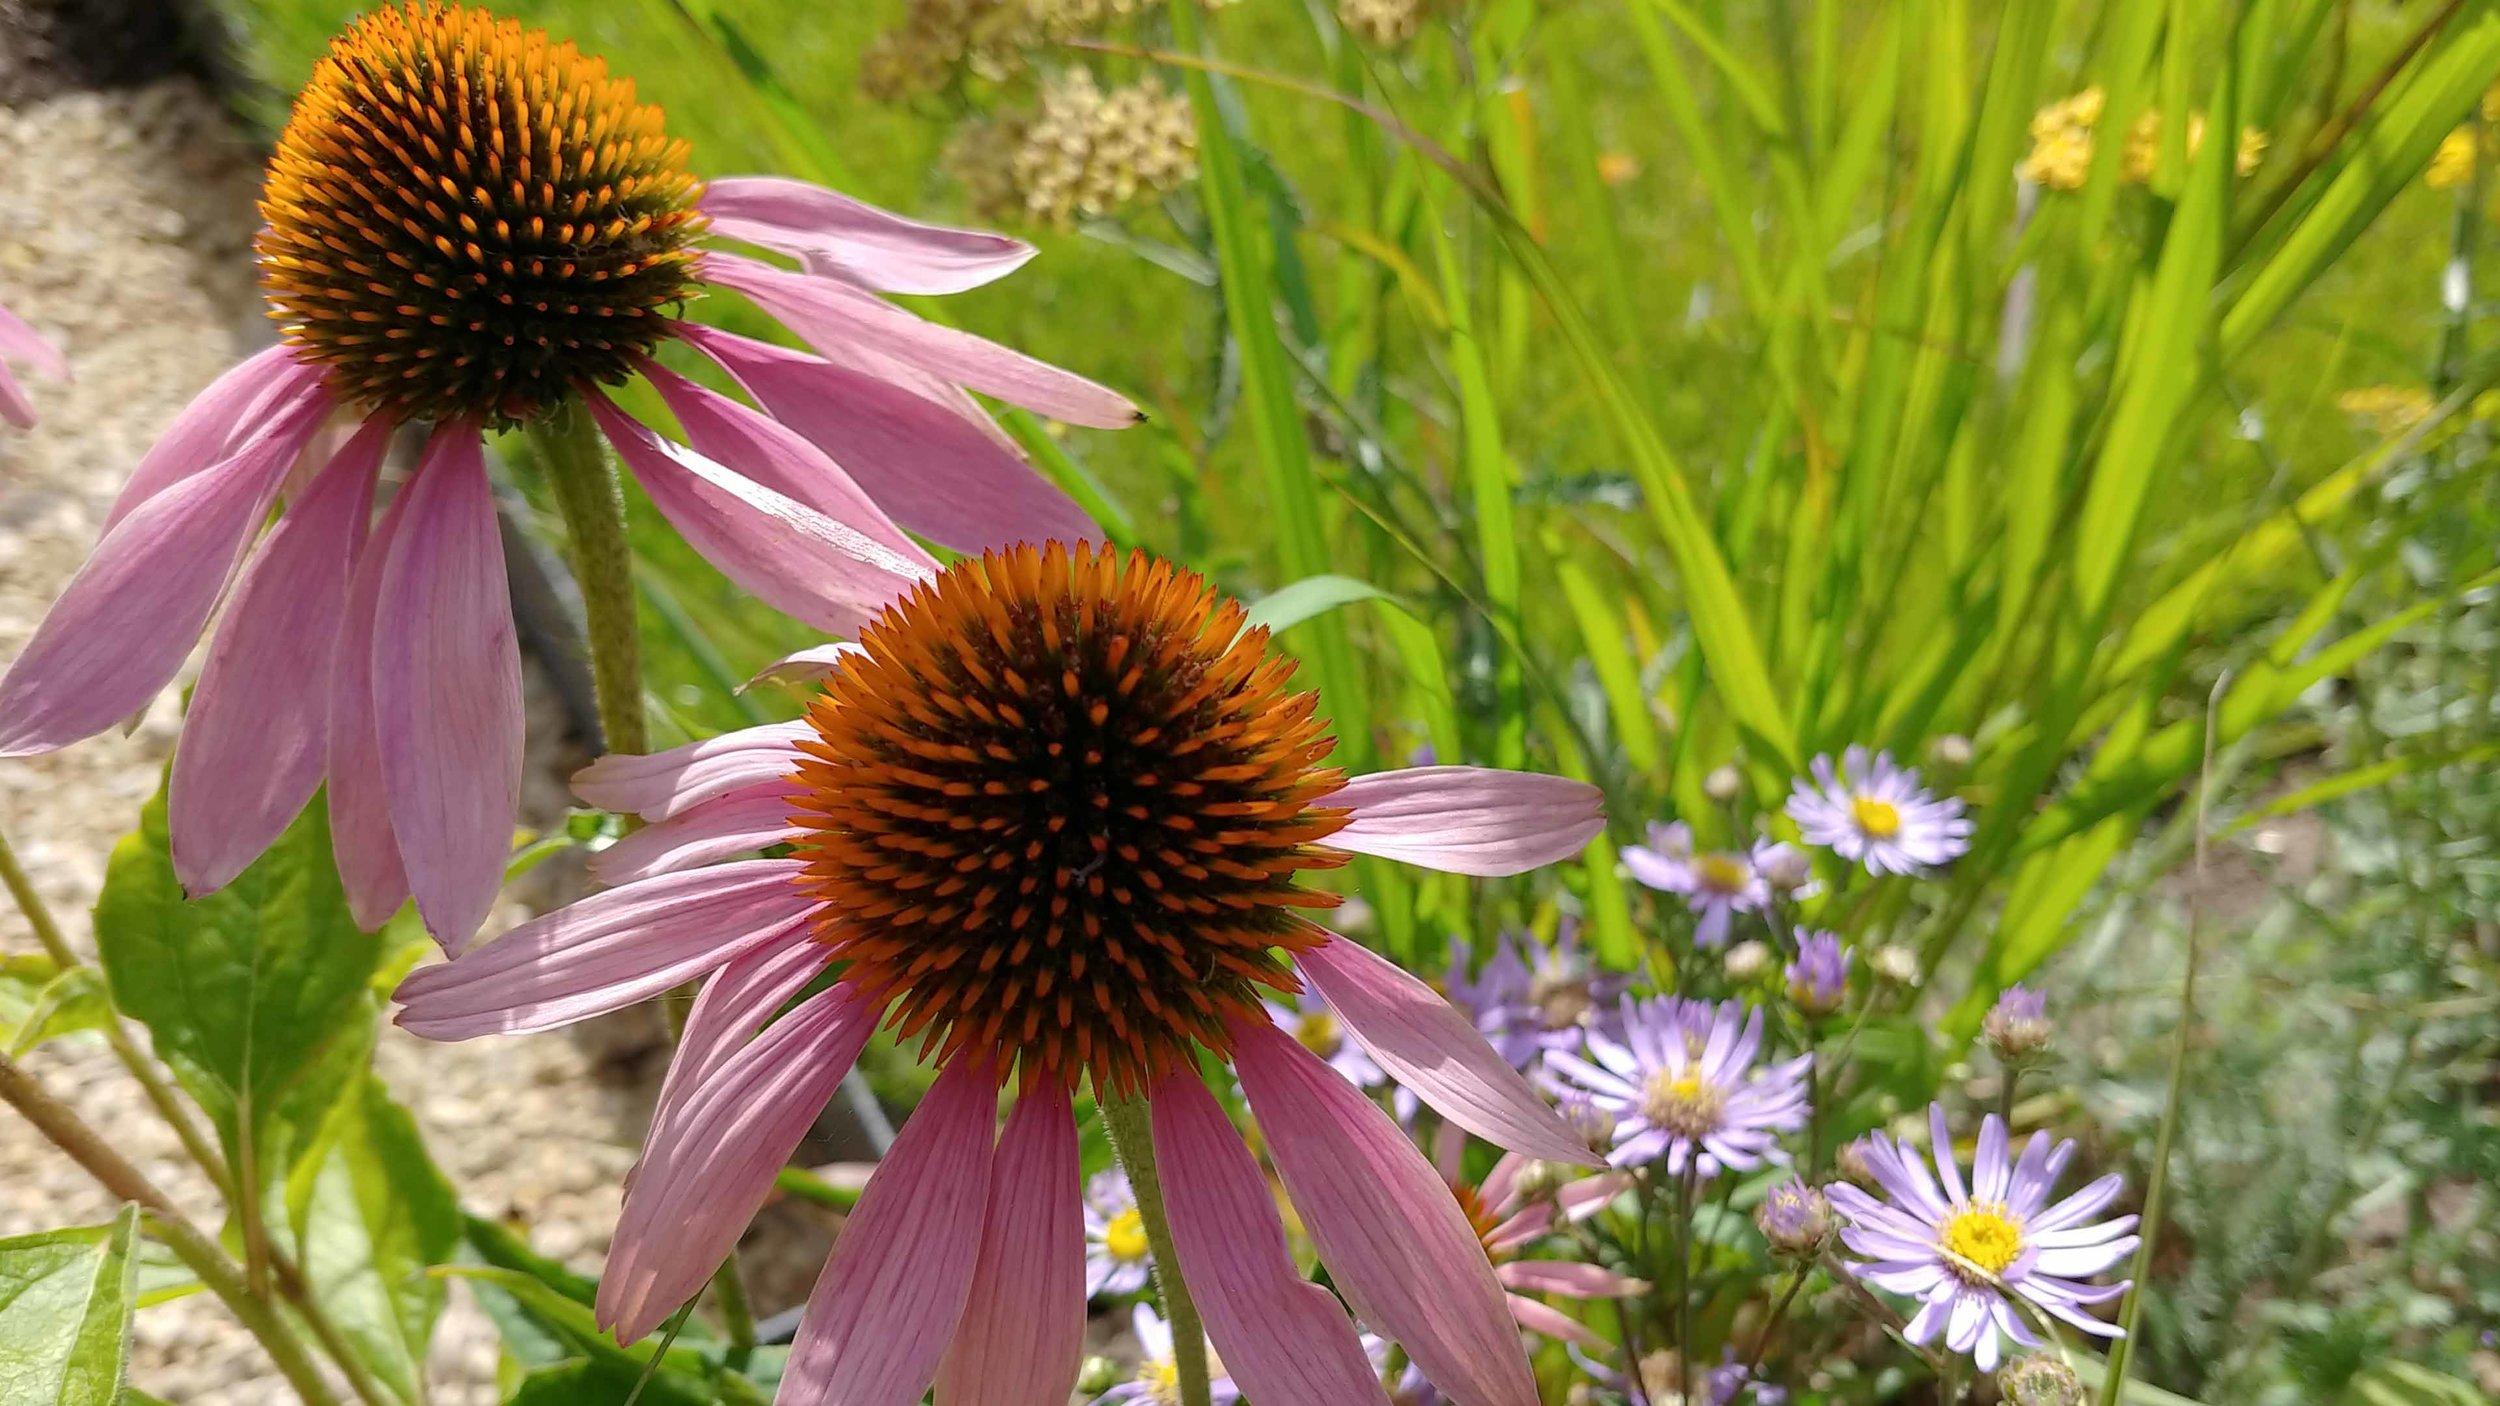 Garden Design Cheshire: Prairie Planting And Porcelain Patio: Echinacea purpurea